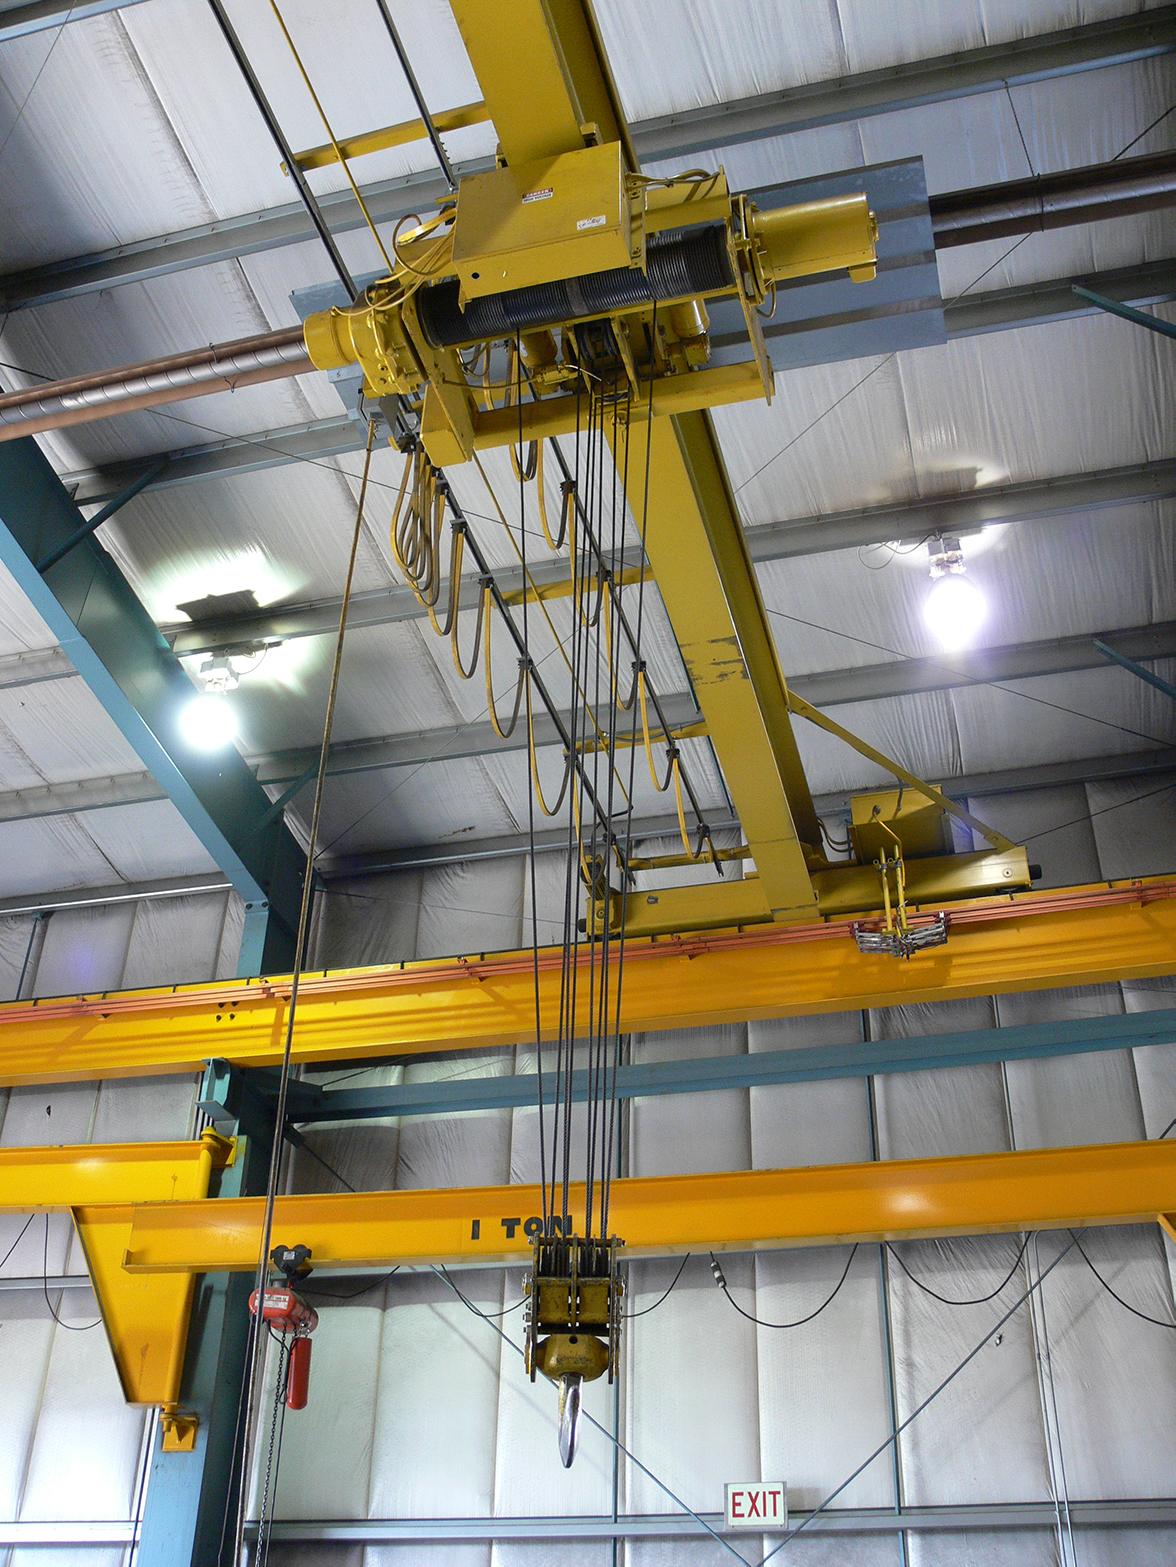 10 ton Bridge Crane with 1 ton Jib Cranes